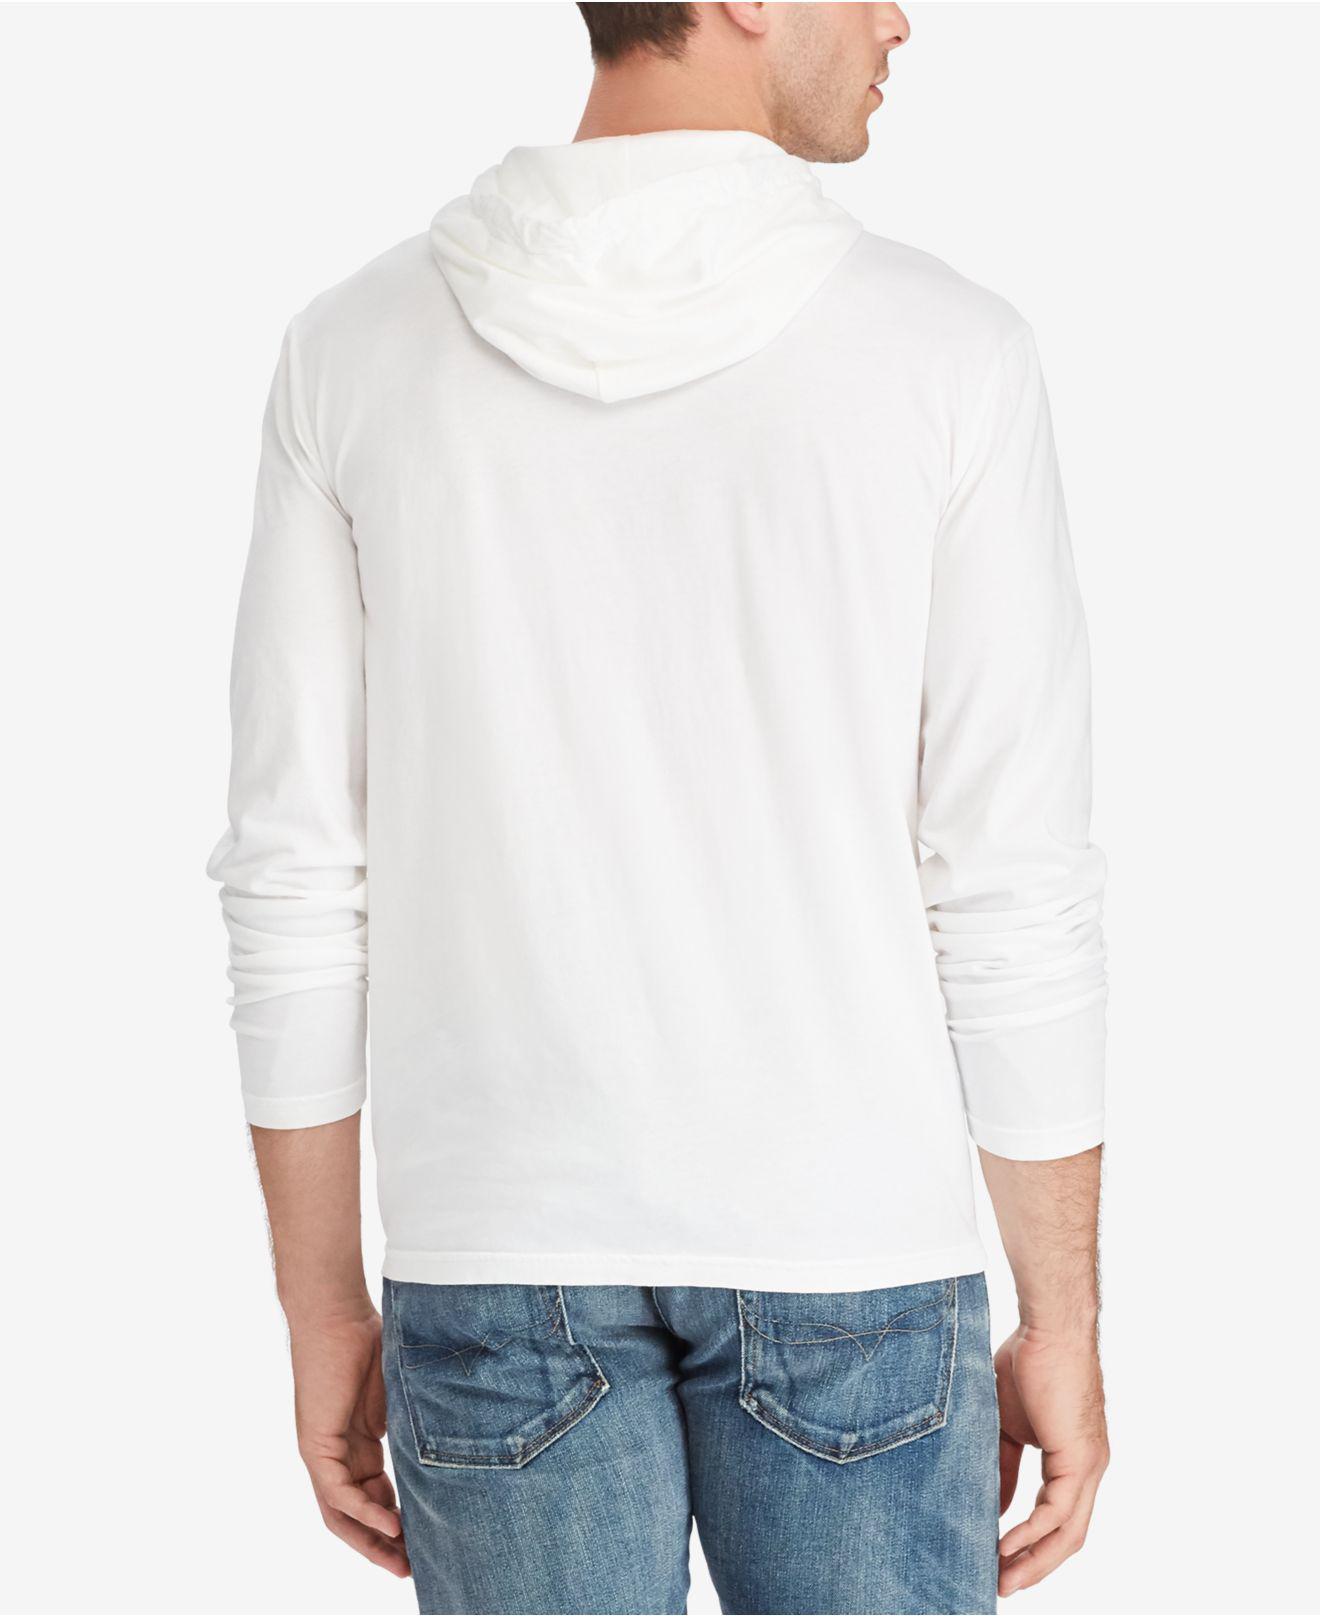 2473b7333207 Lyst - Polo Ralph Lauren Men s Jersey T-shirt Hoodie in White for Men